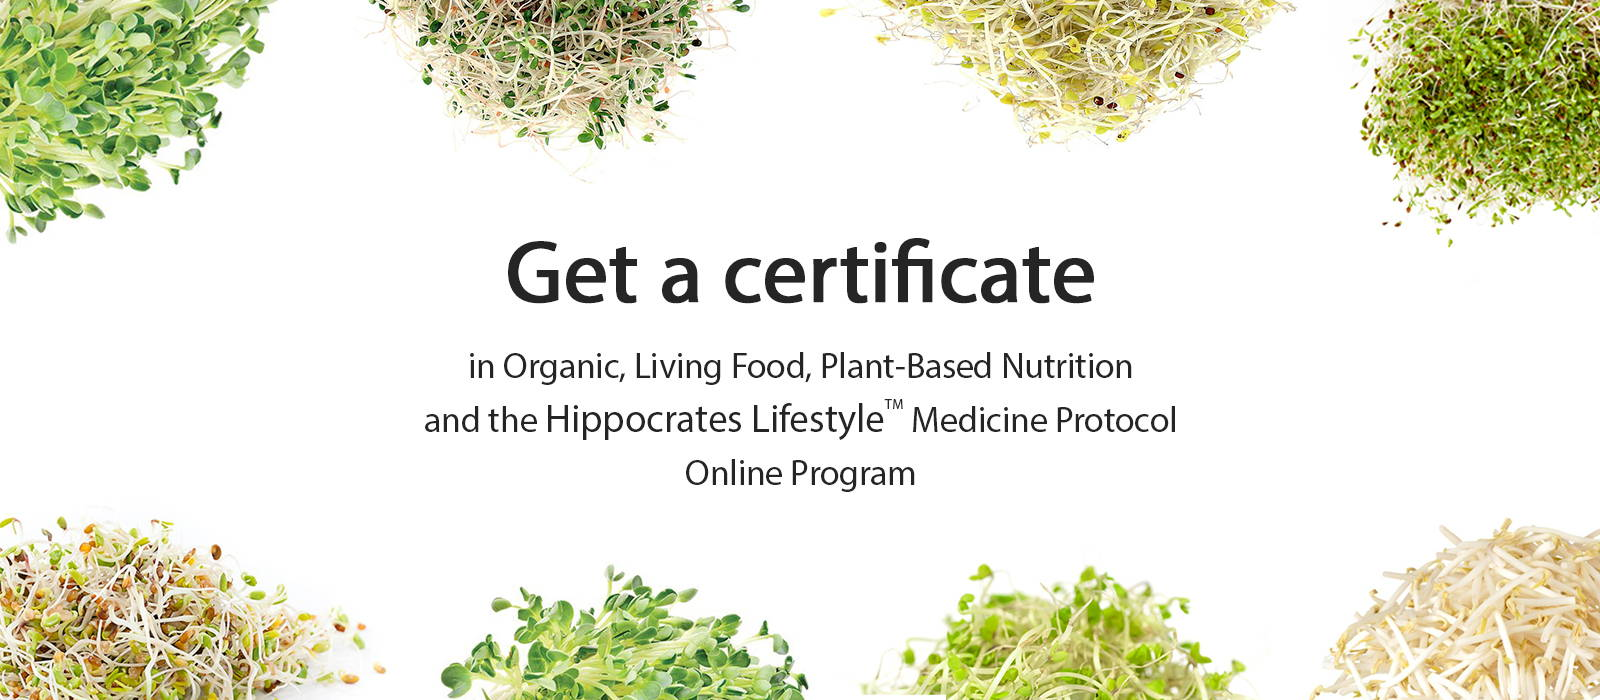 Hippocrates Lifestyle Online program - for optimum nutrition ...